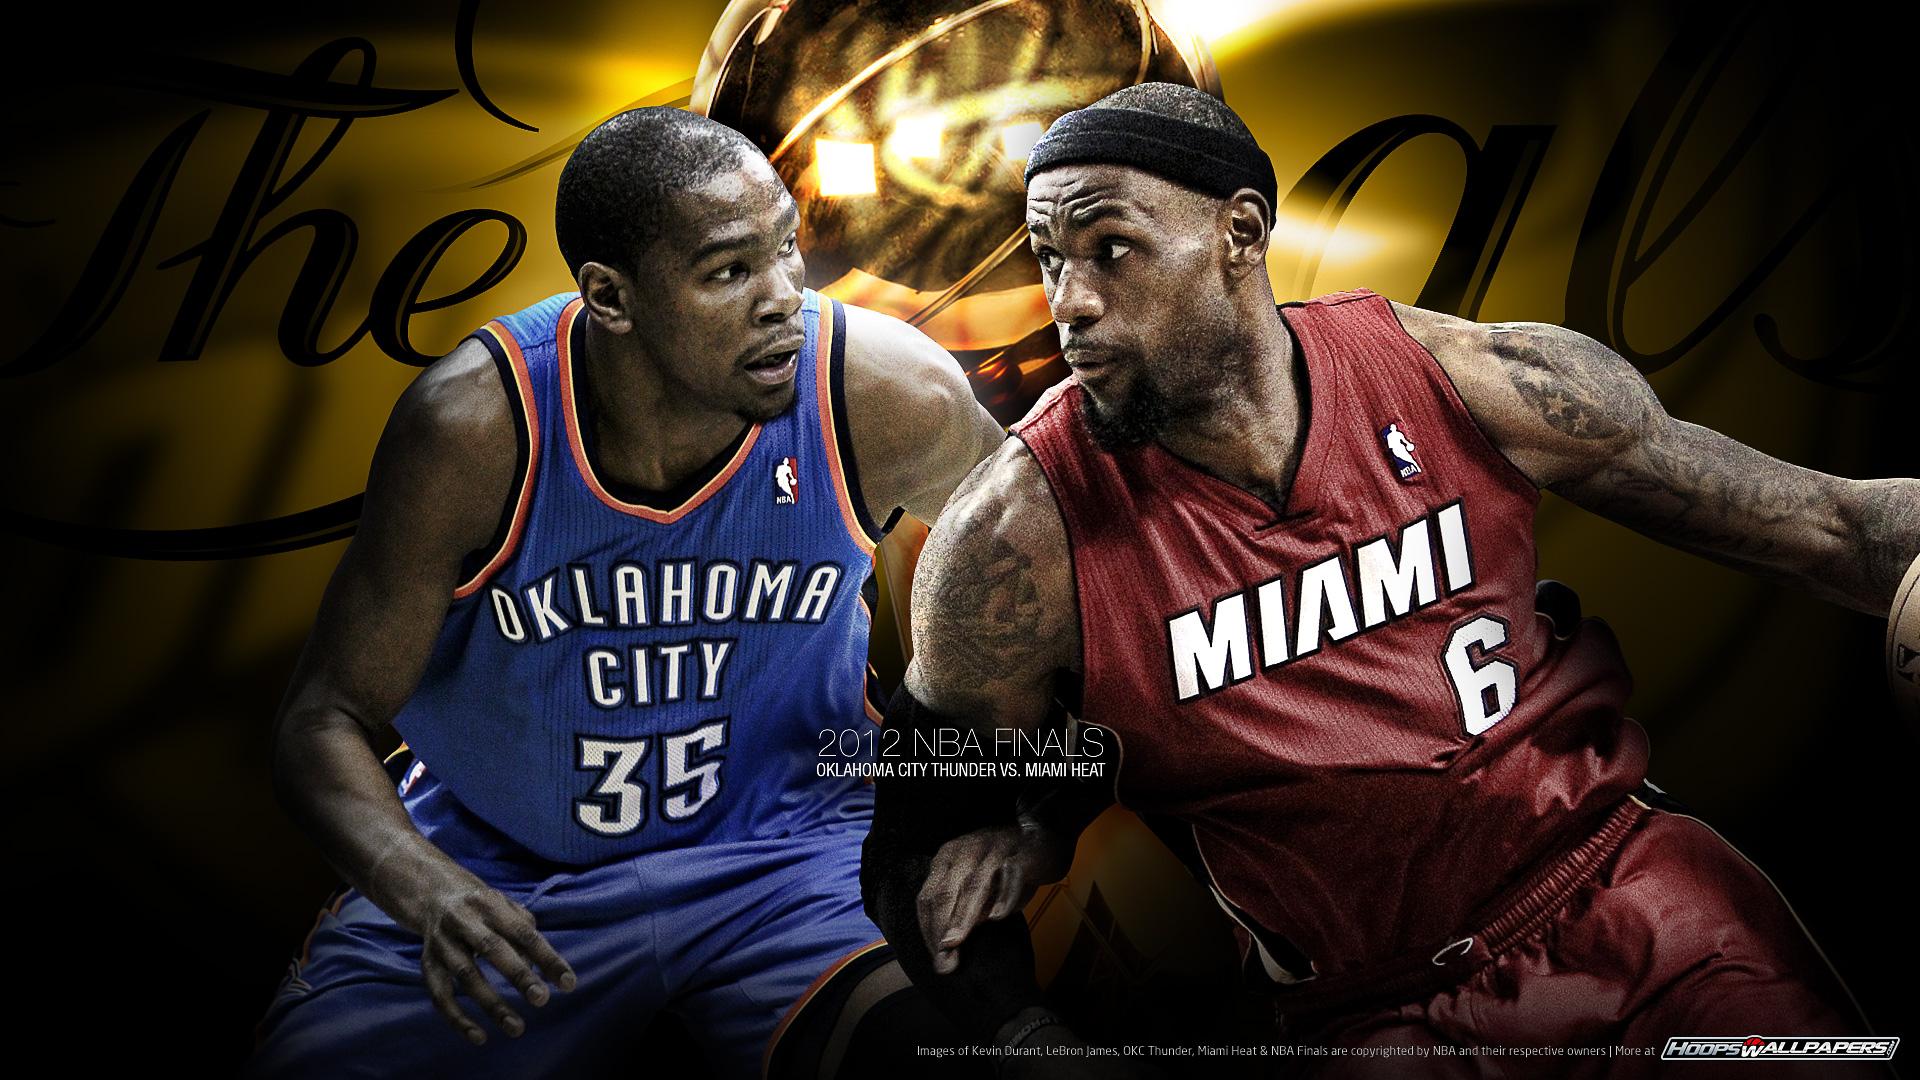 NBA wallpapers at HoopsWallpaperscom Newest NBA and basketball 1920x1080